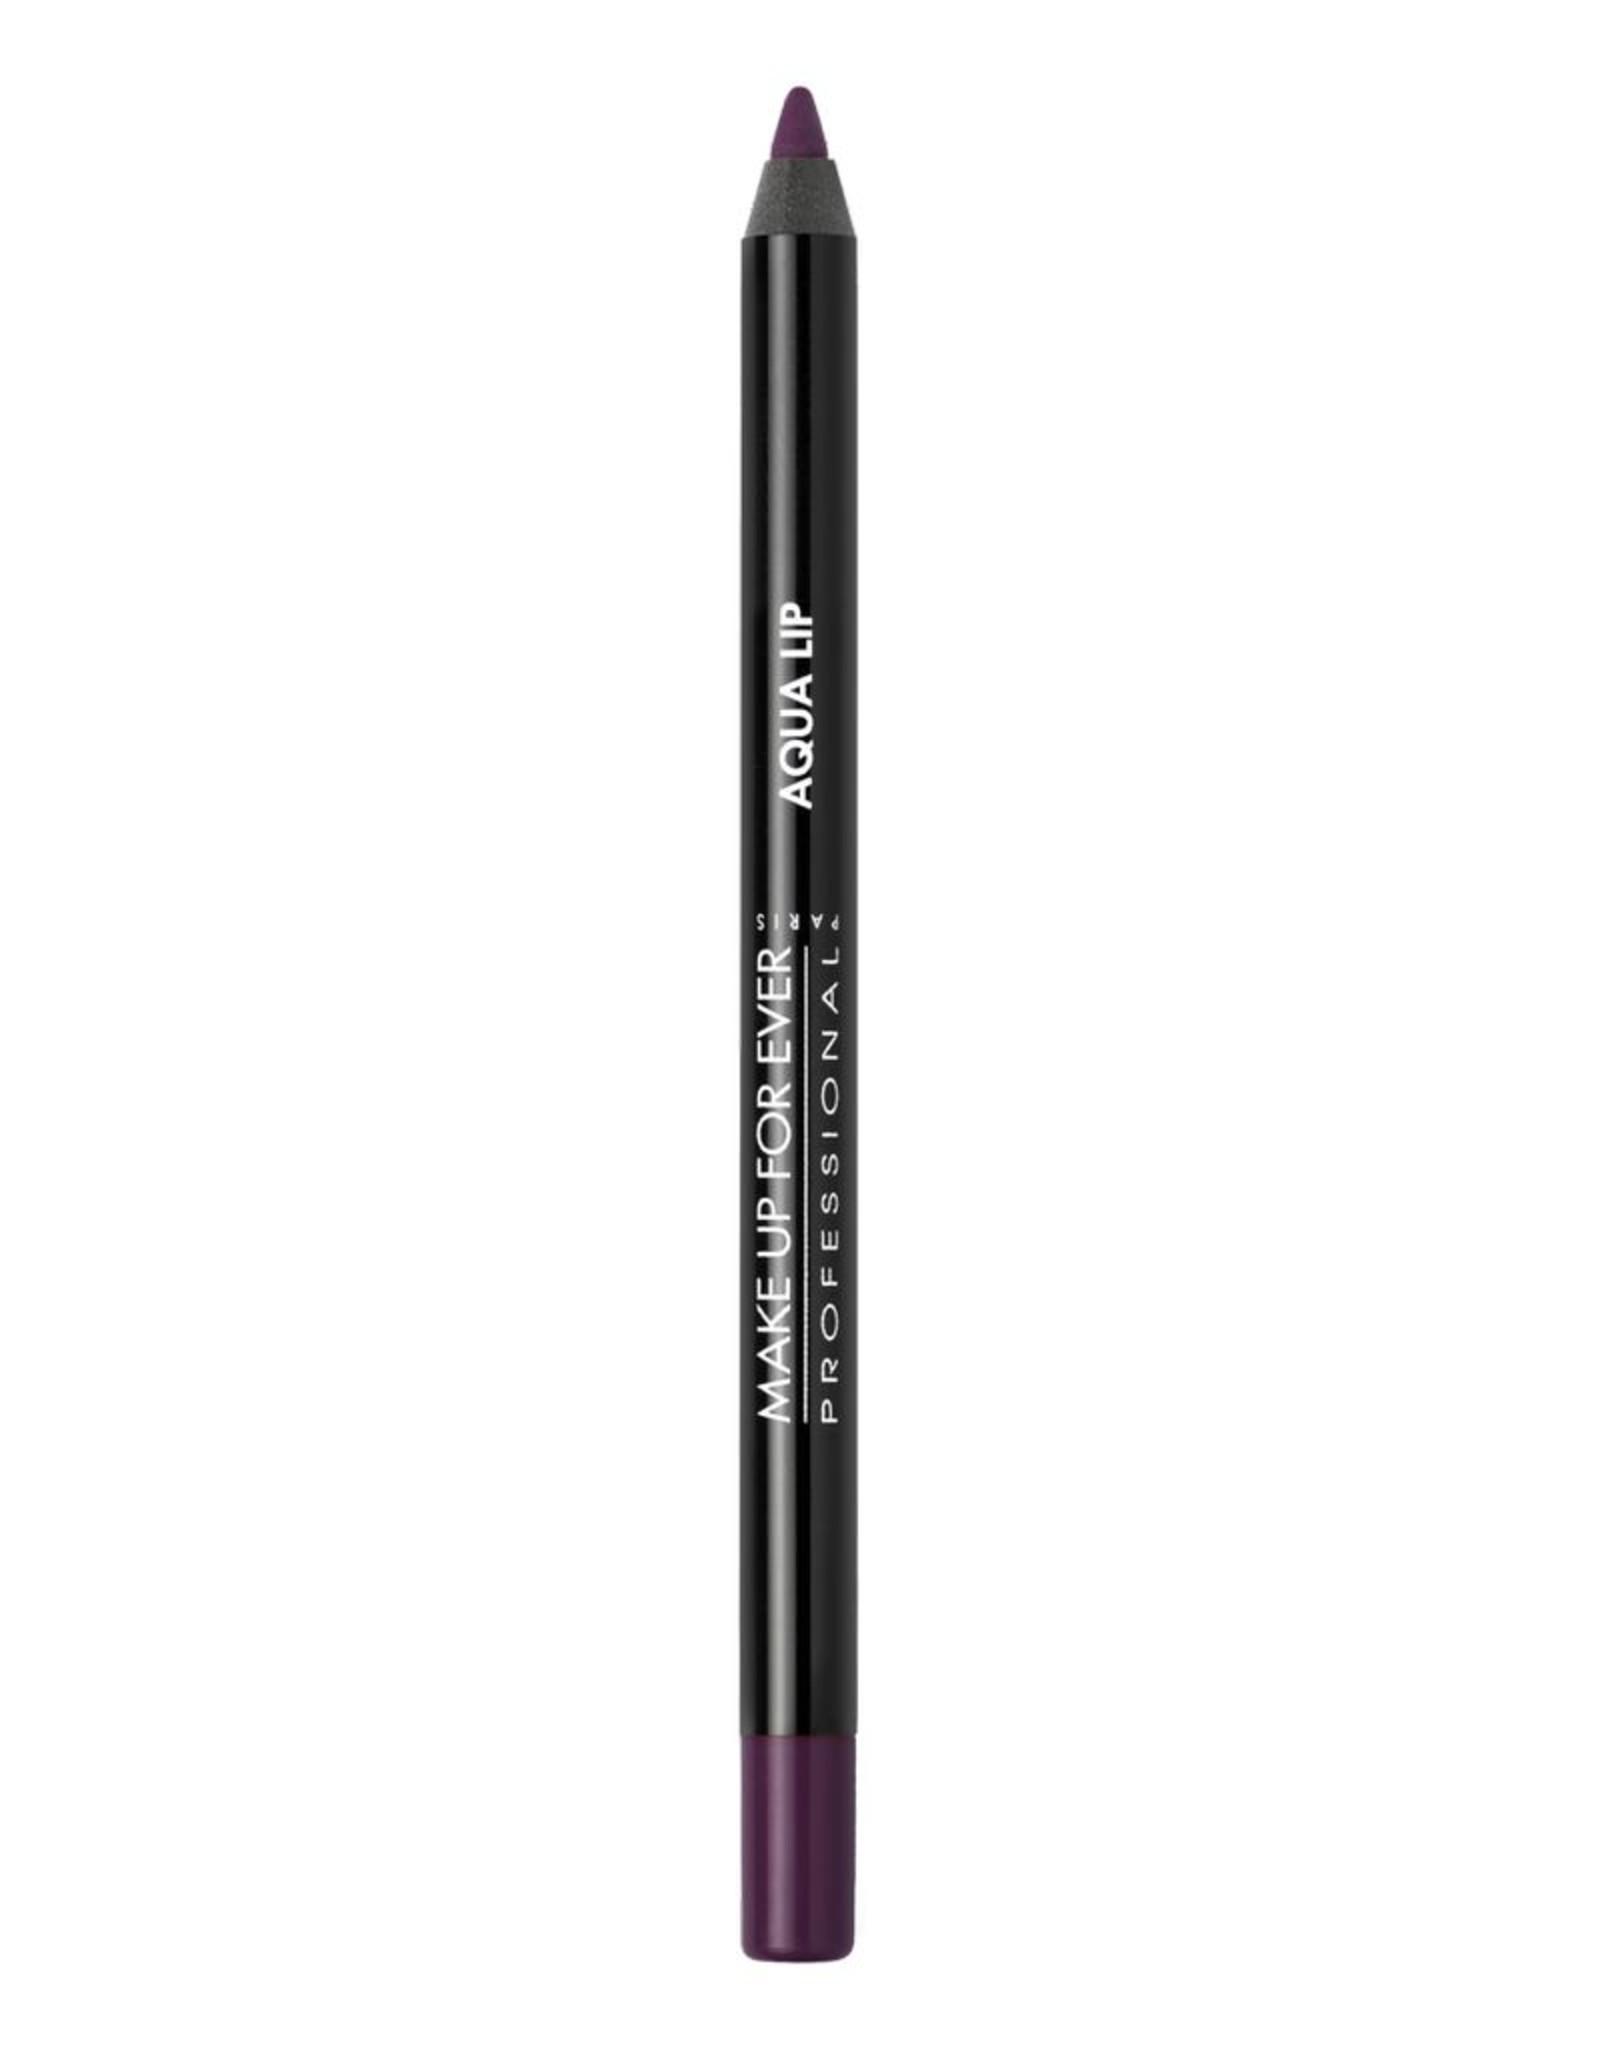 MUFE AQUA LIP CRAYON WTP 1,2G 13 C mauve /  Purple